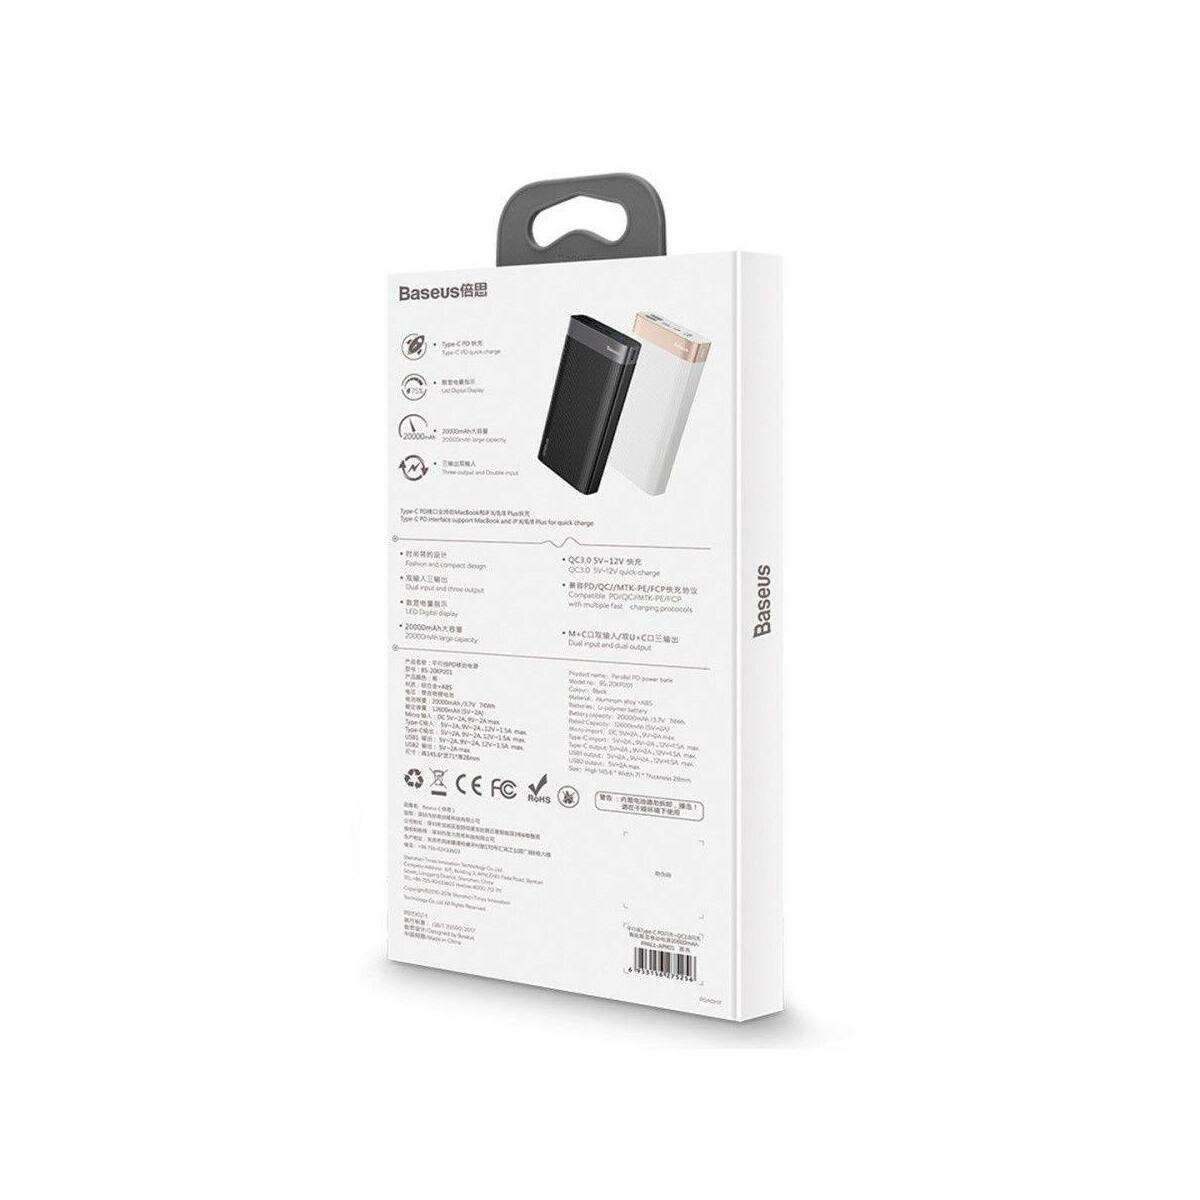 Baseus Power Bank Parallel (Micro USB + Type-C bemenet / dupla USB + Type-C PD kimenet), 18W, 5A, 20.000 mAh, fekete (PPALL-APX01)